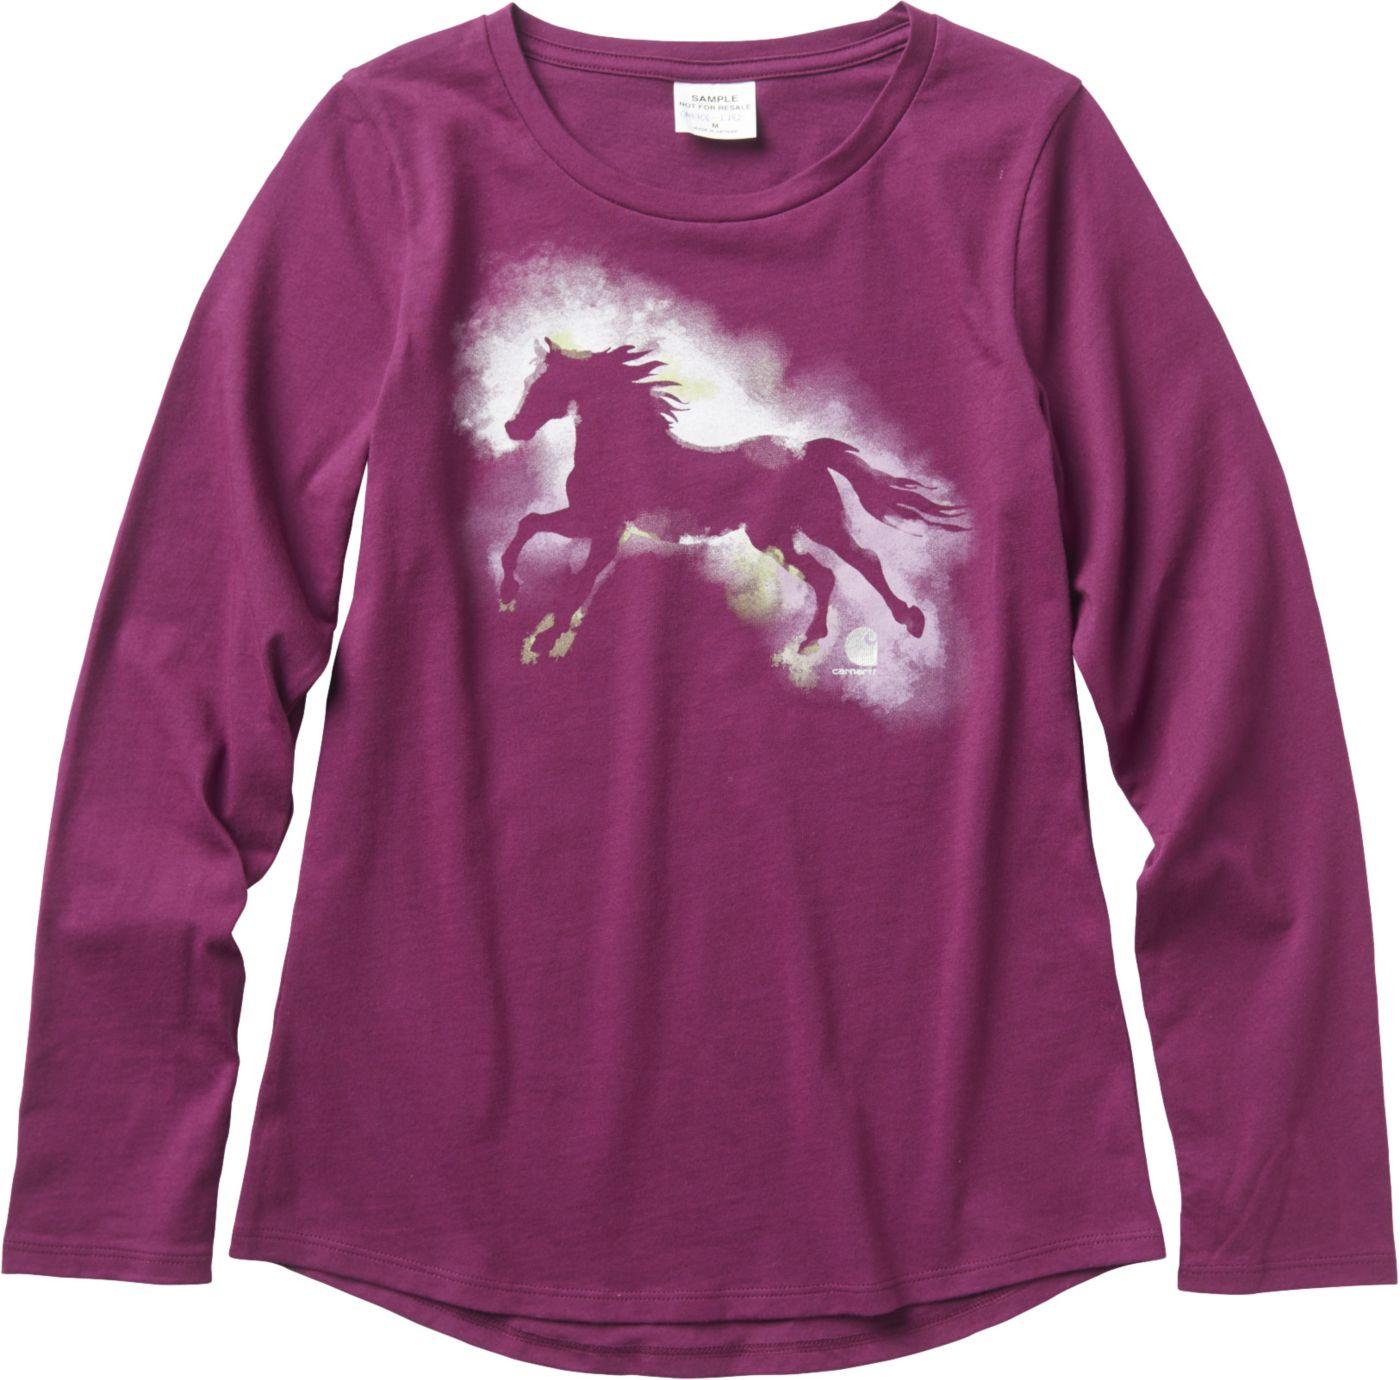 Carhartt Girls' Long Sleeve Watercolor Horse T-Shirt